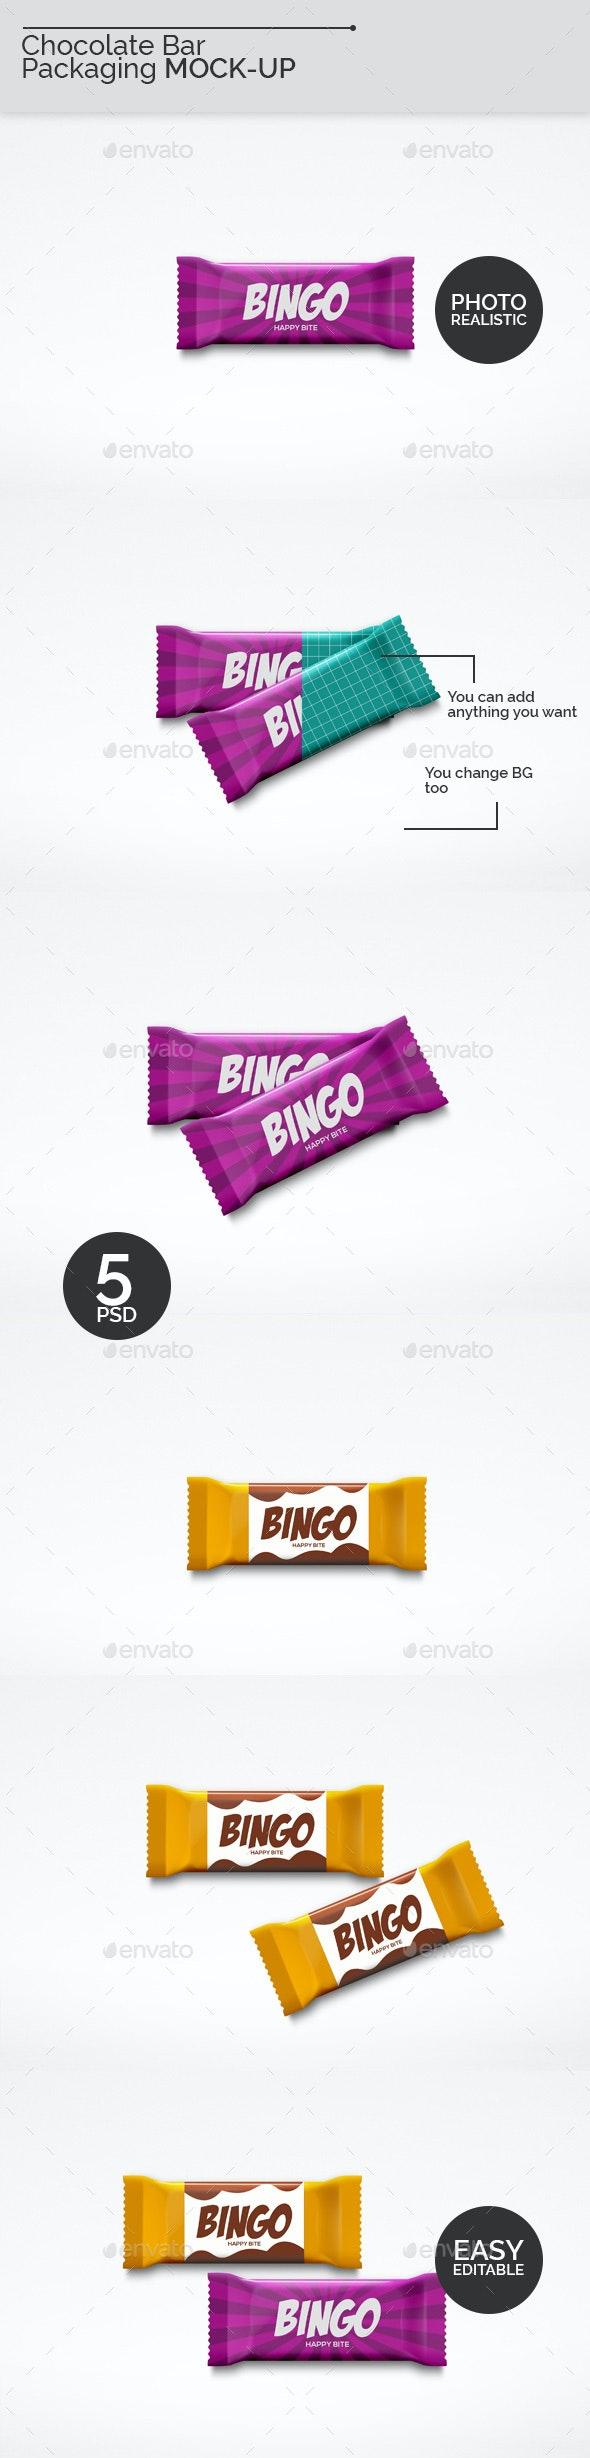 Chocolate Bar Packaging Mock-Ups - Food and Drink Packaging